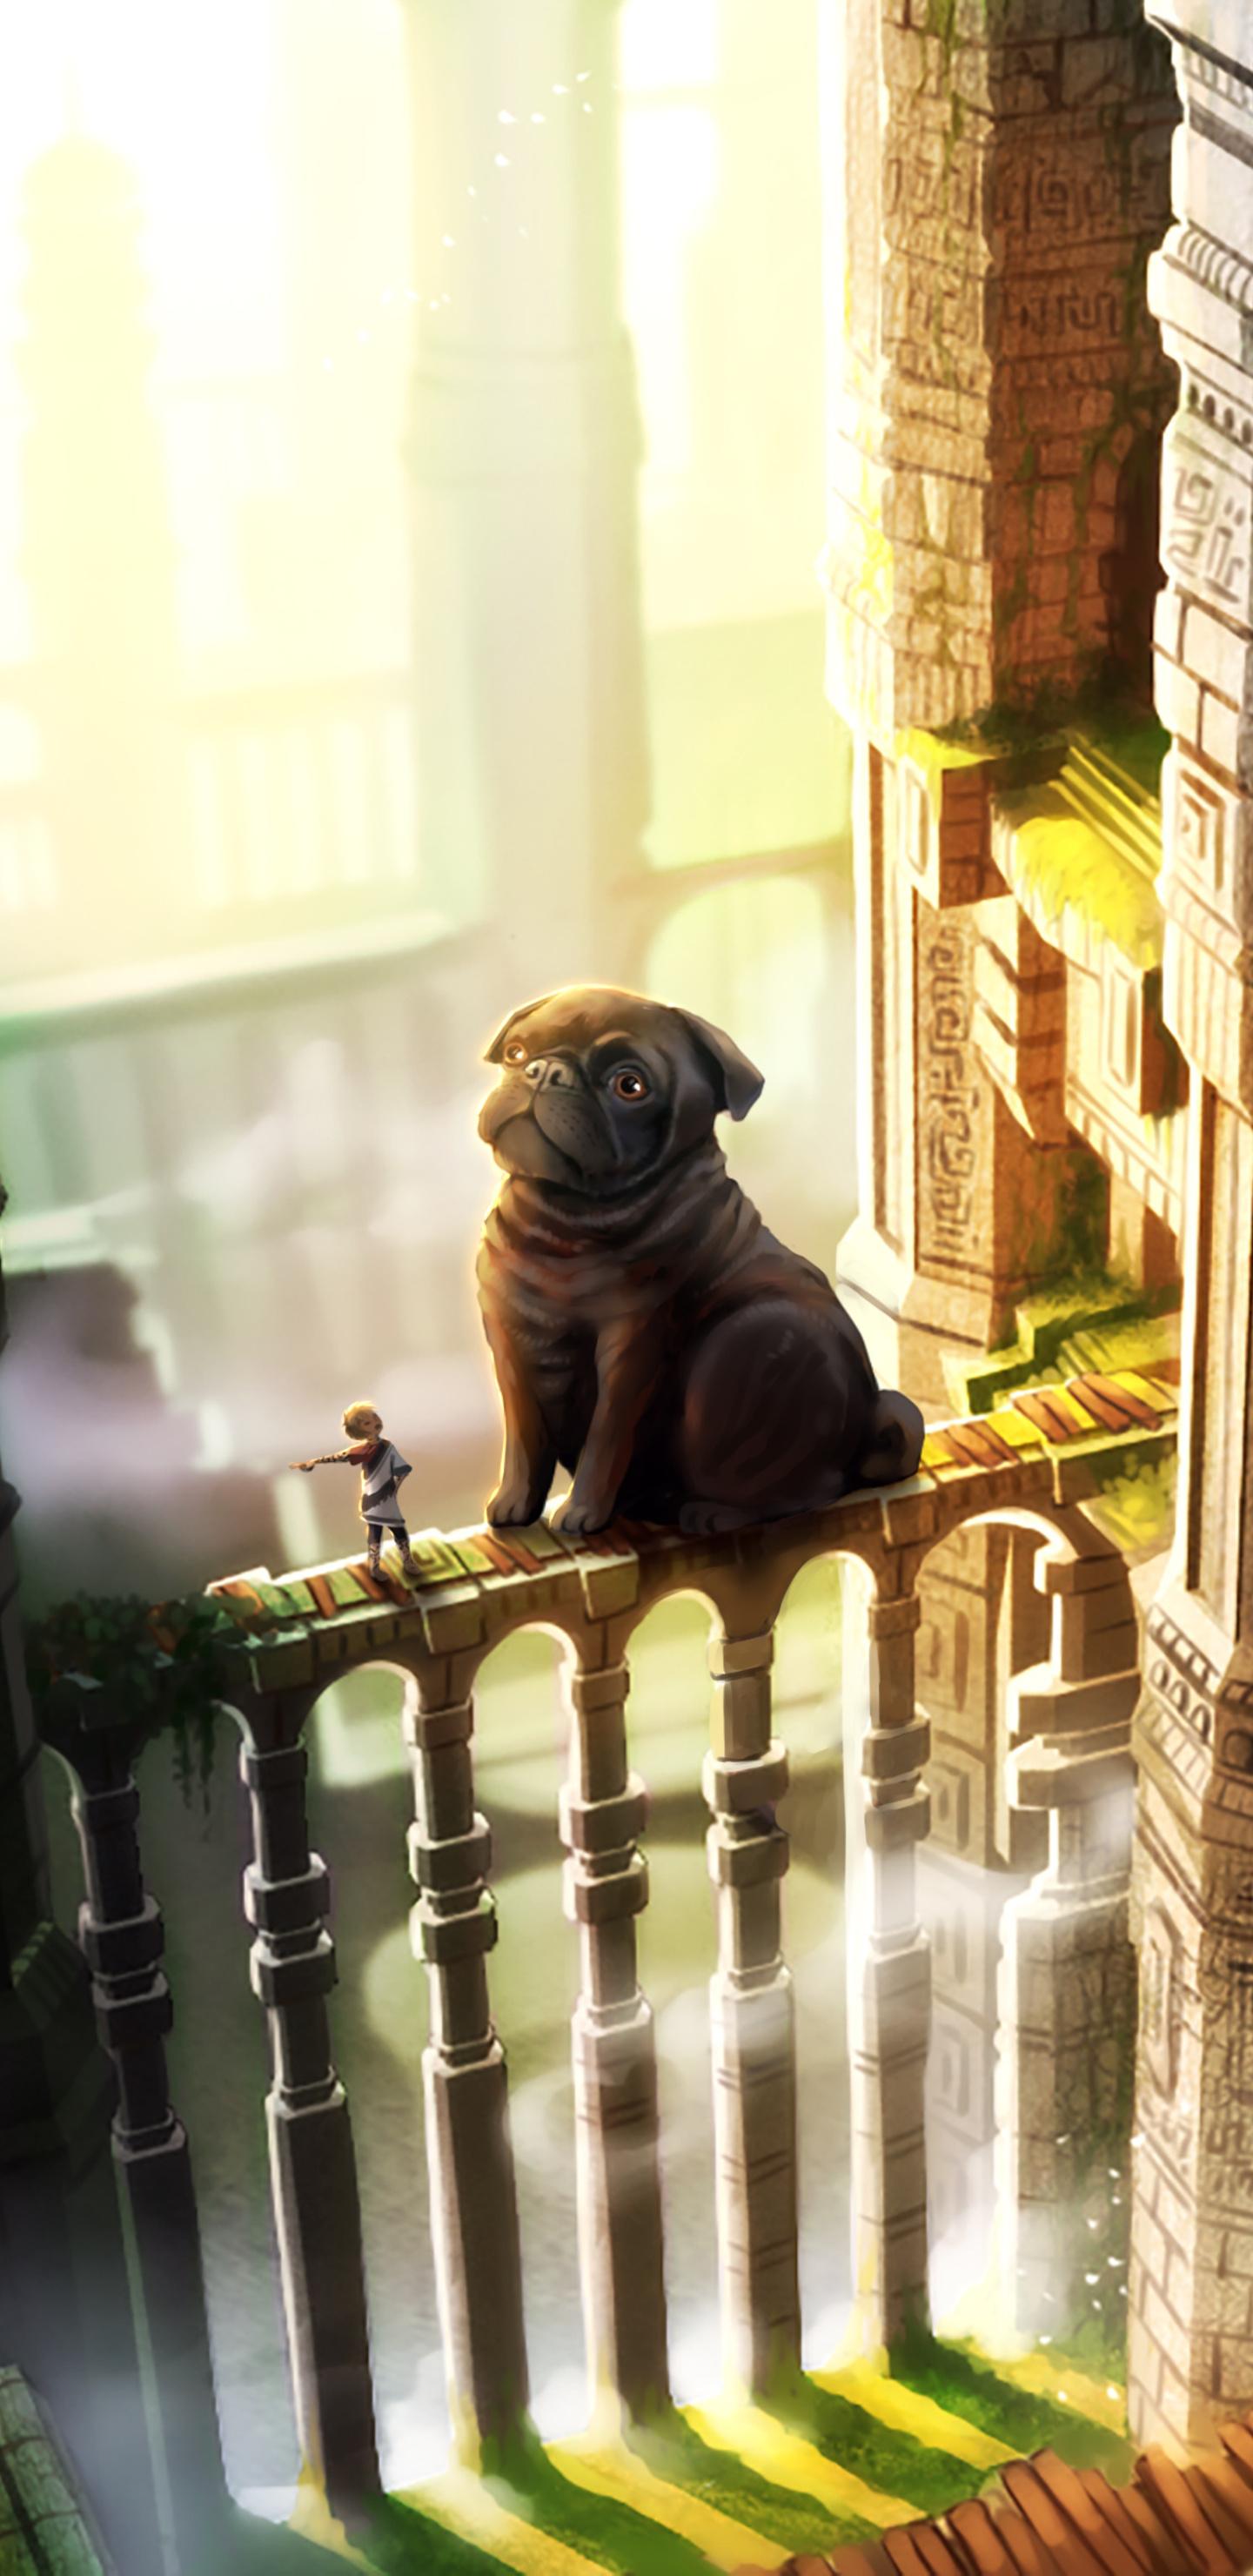 the-last-guardian-pug-dog-5k-9j.jpg